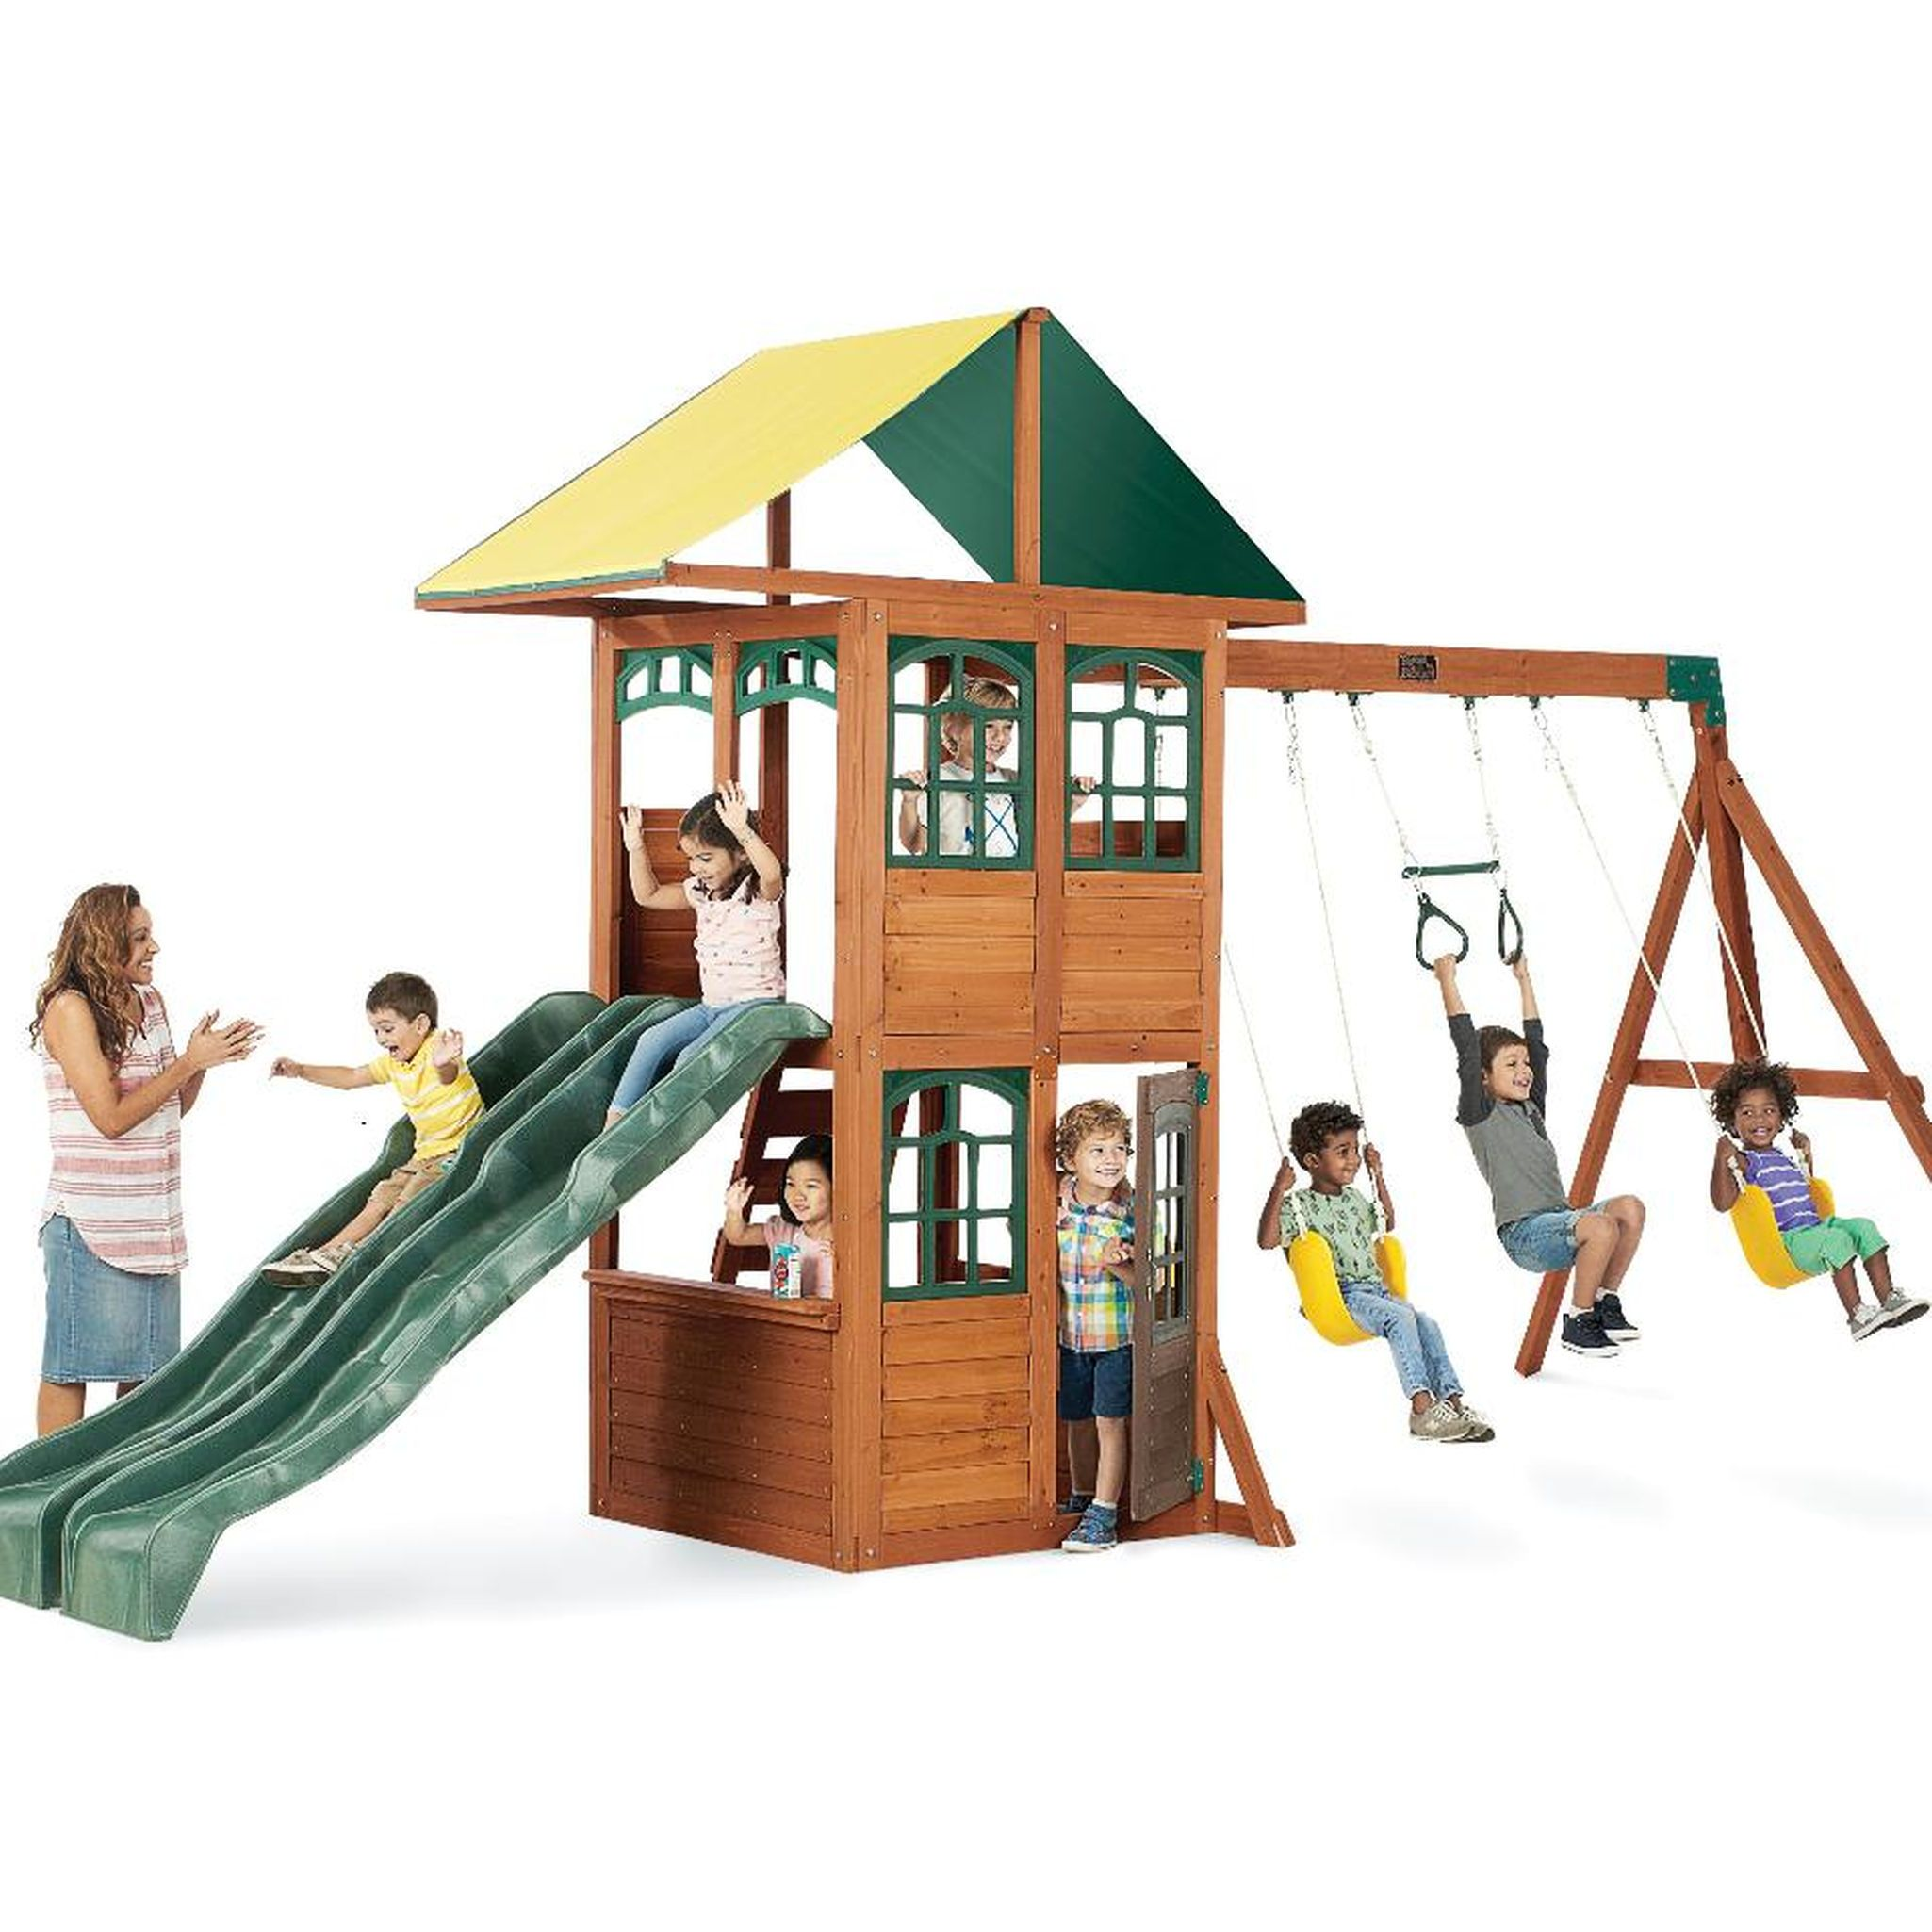 Big Backyard Swing Sets big backyard treasure cove wood swing set | your pinterest likes